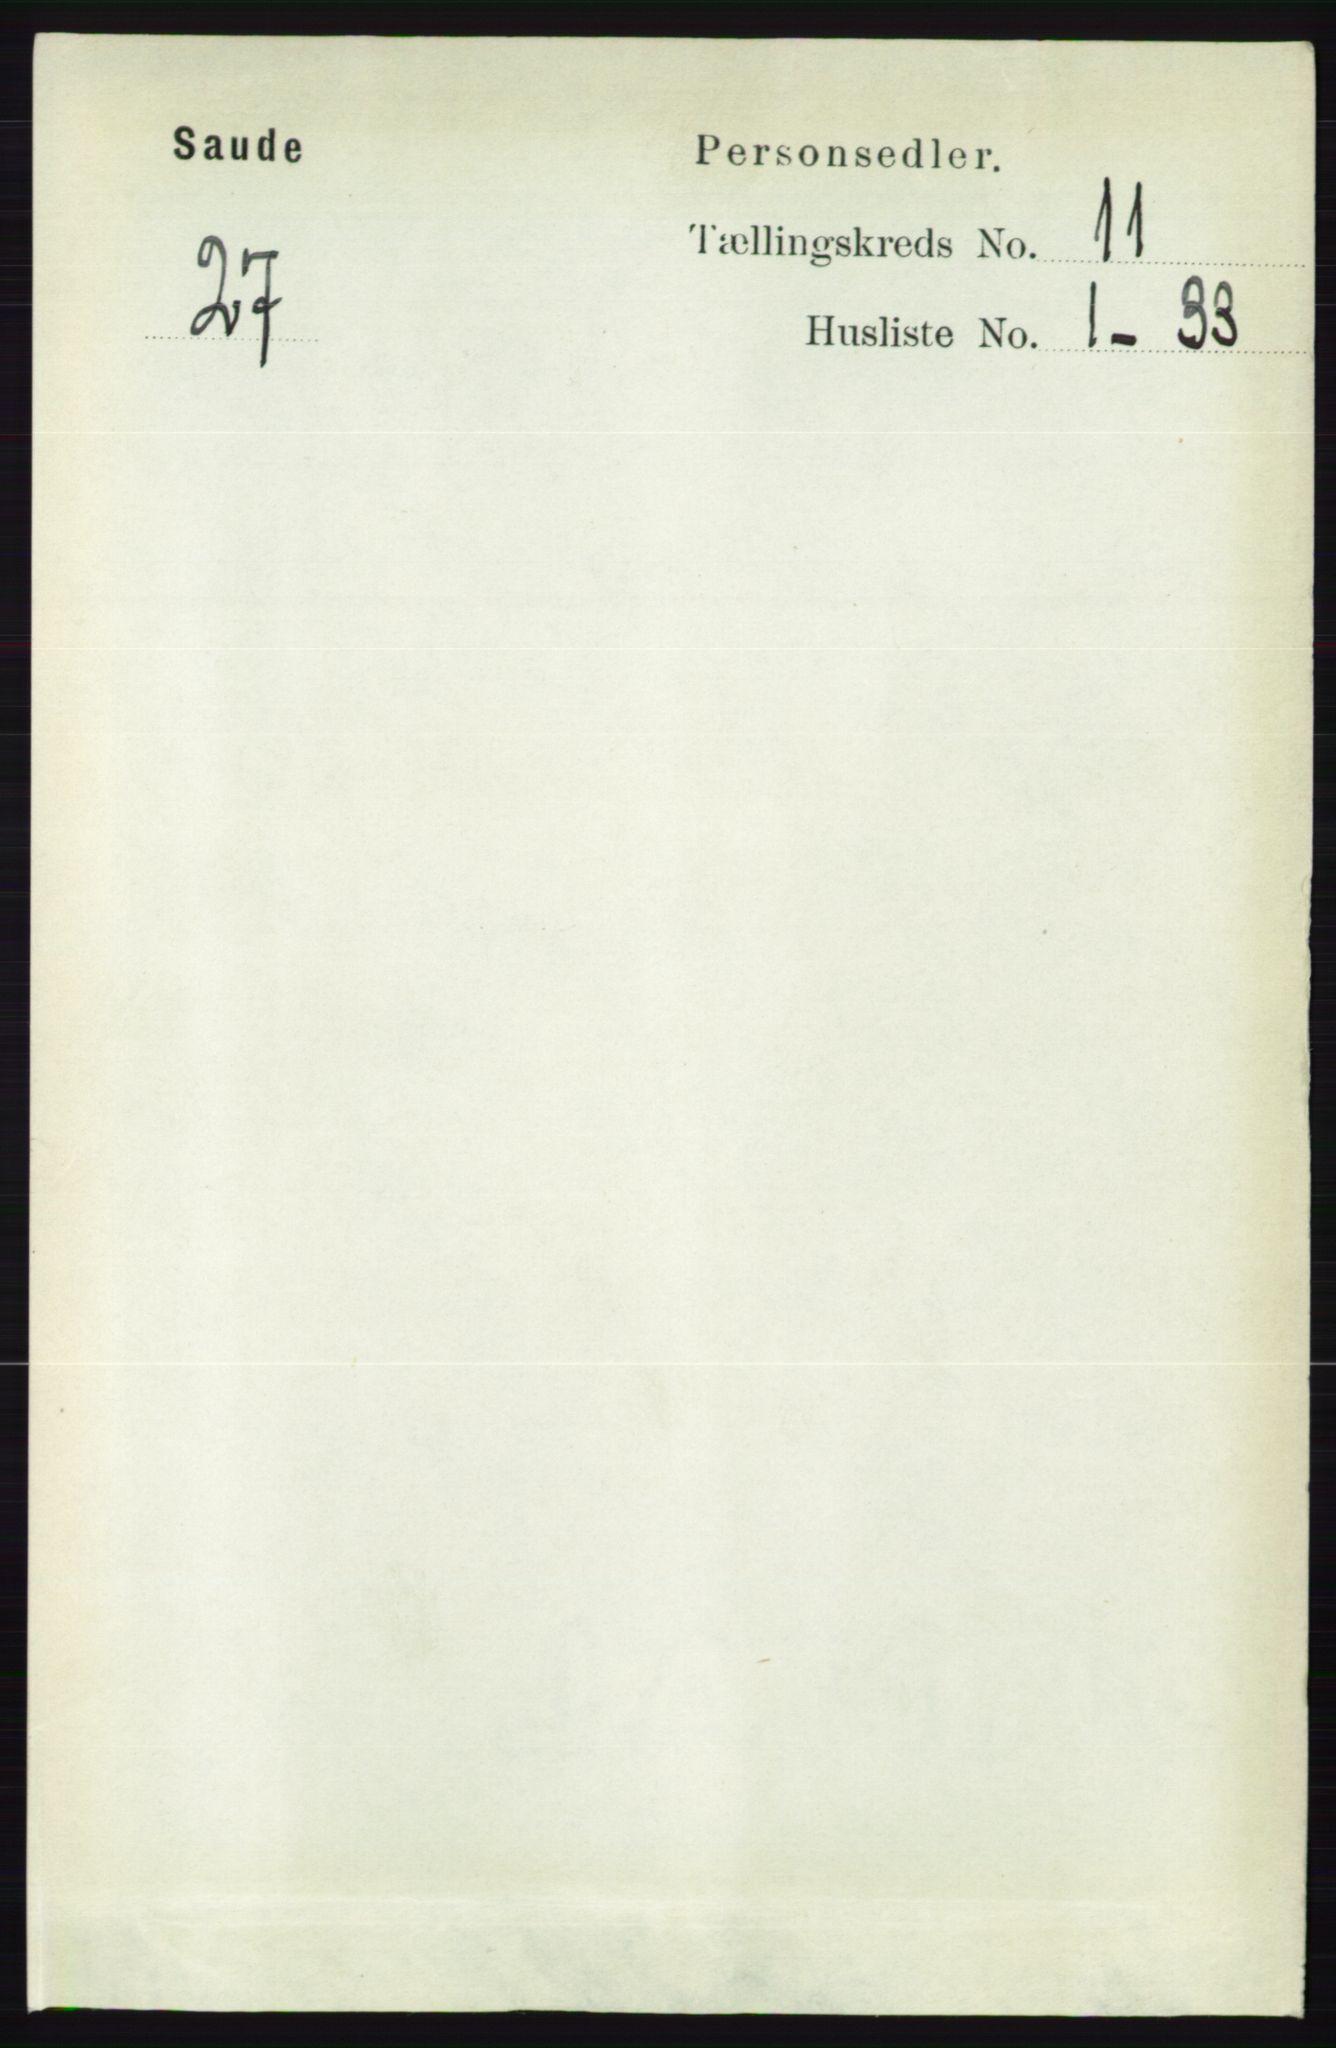 RA, Folketelling 1891 for 0822 Sauherad herred, 1891, s. 3376